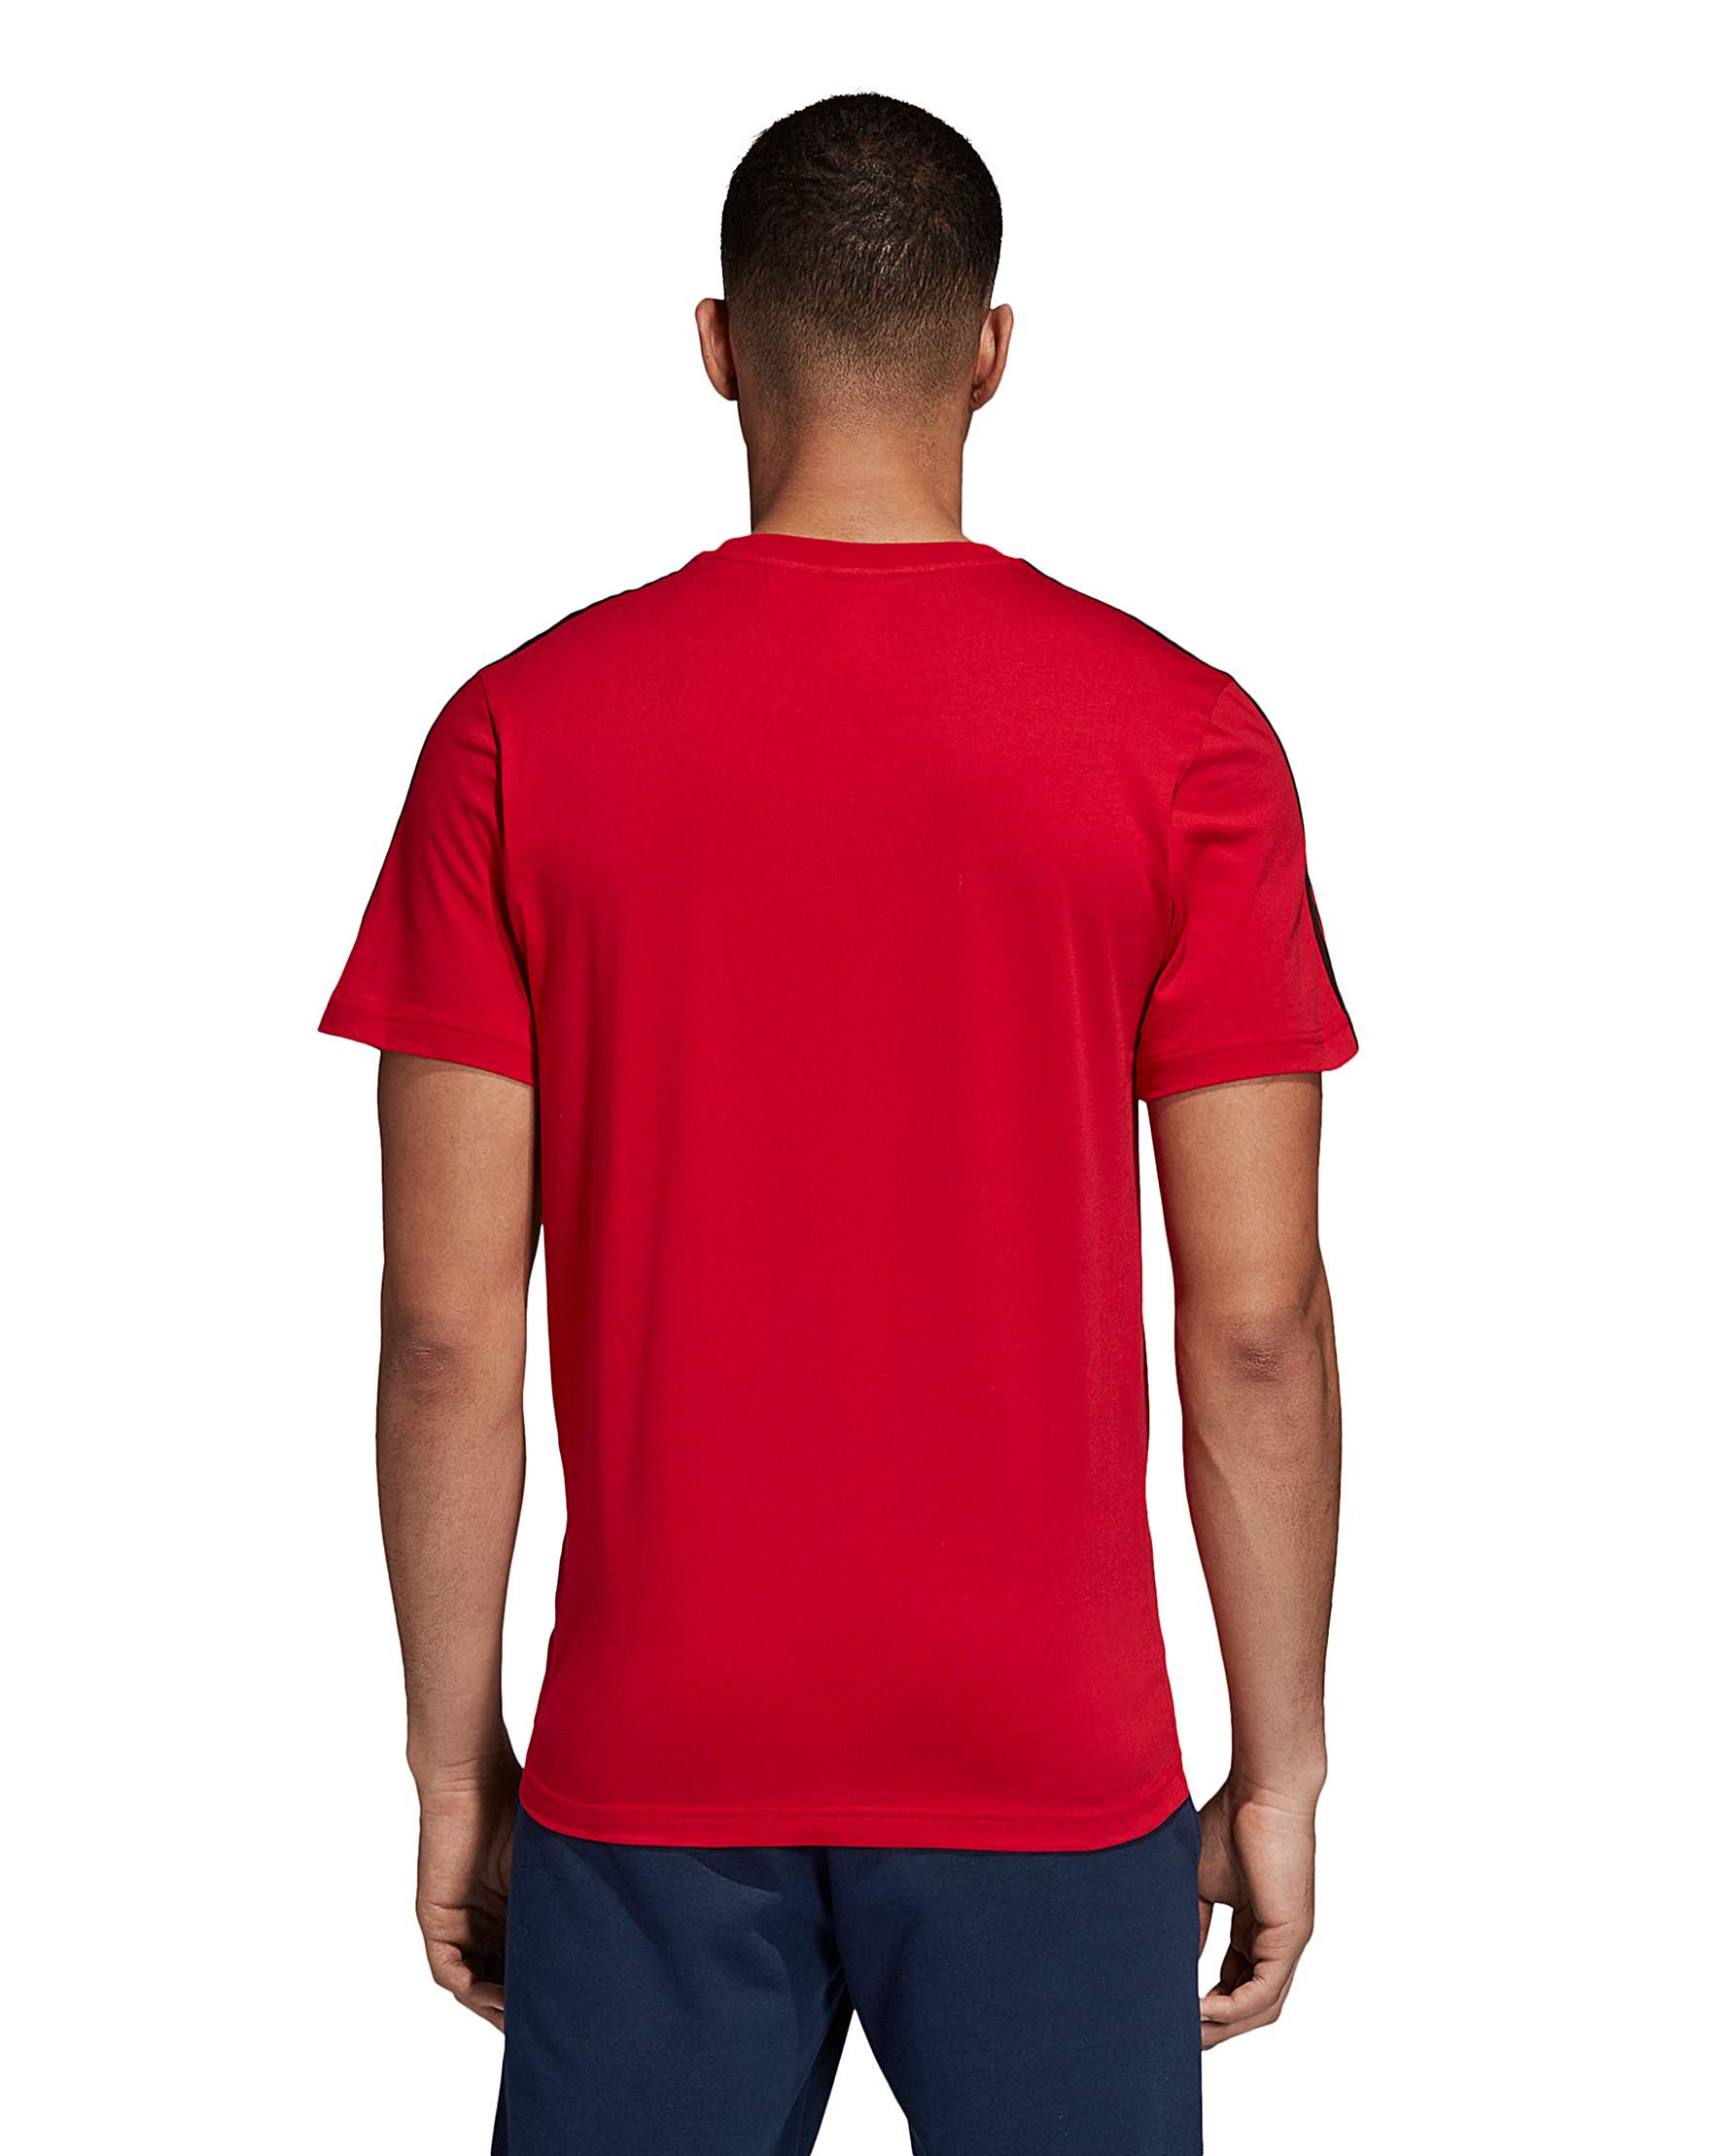 sale retailer 4a455 457aa MUFC adidas 3 Stripe Tee   Jacamo